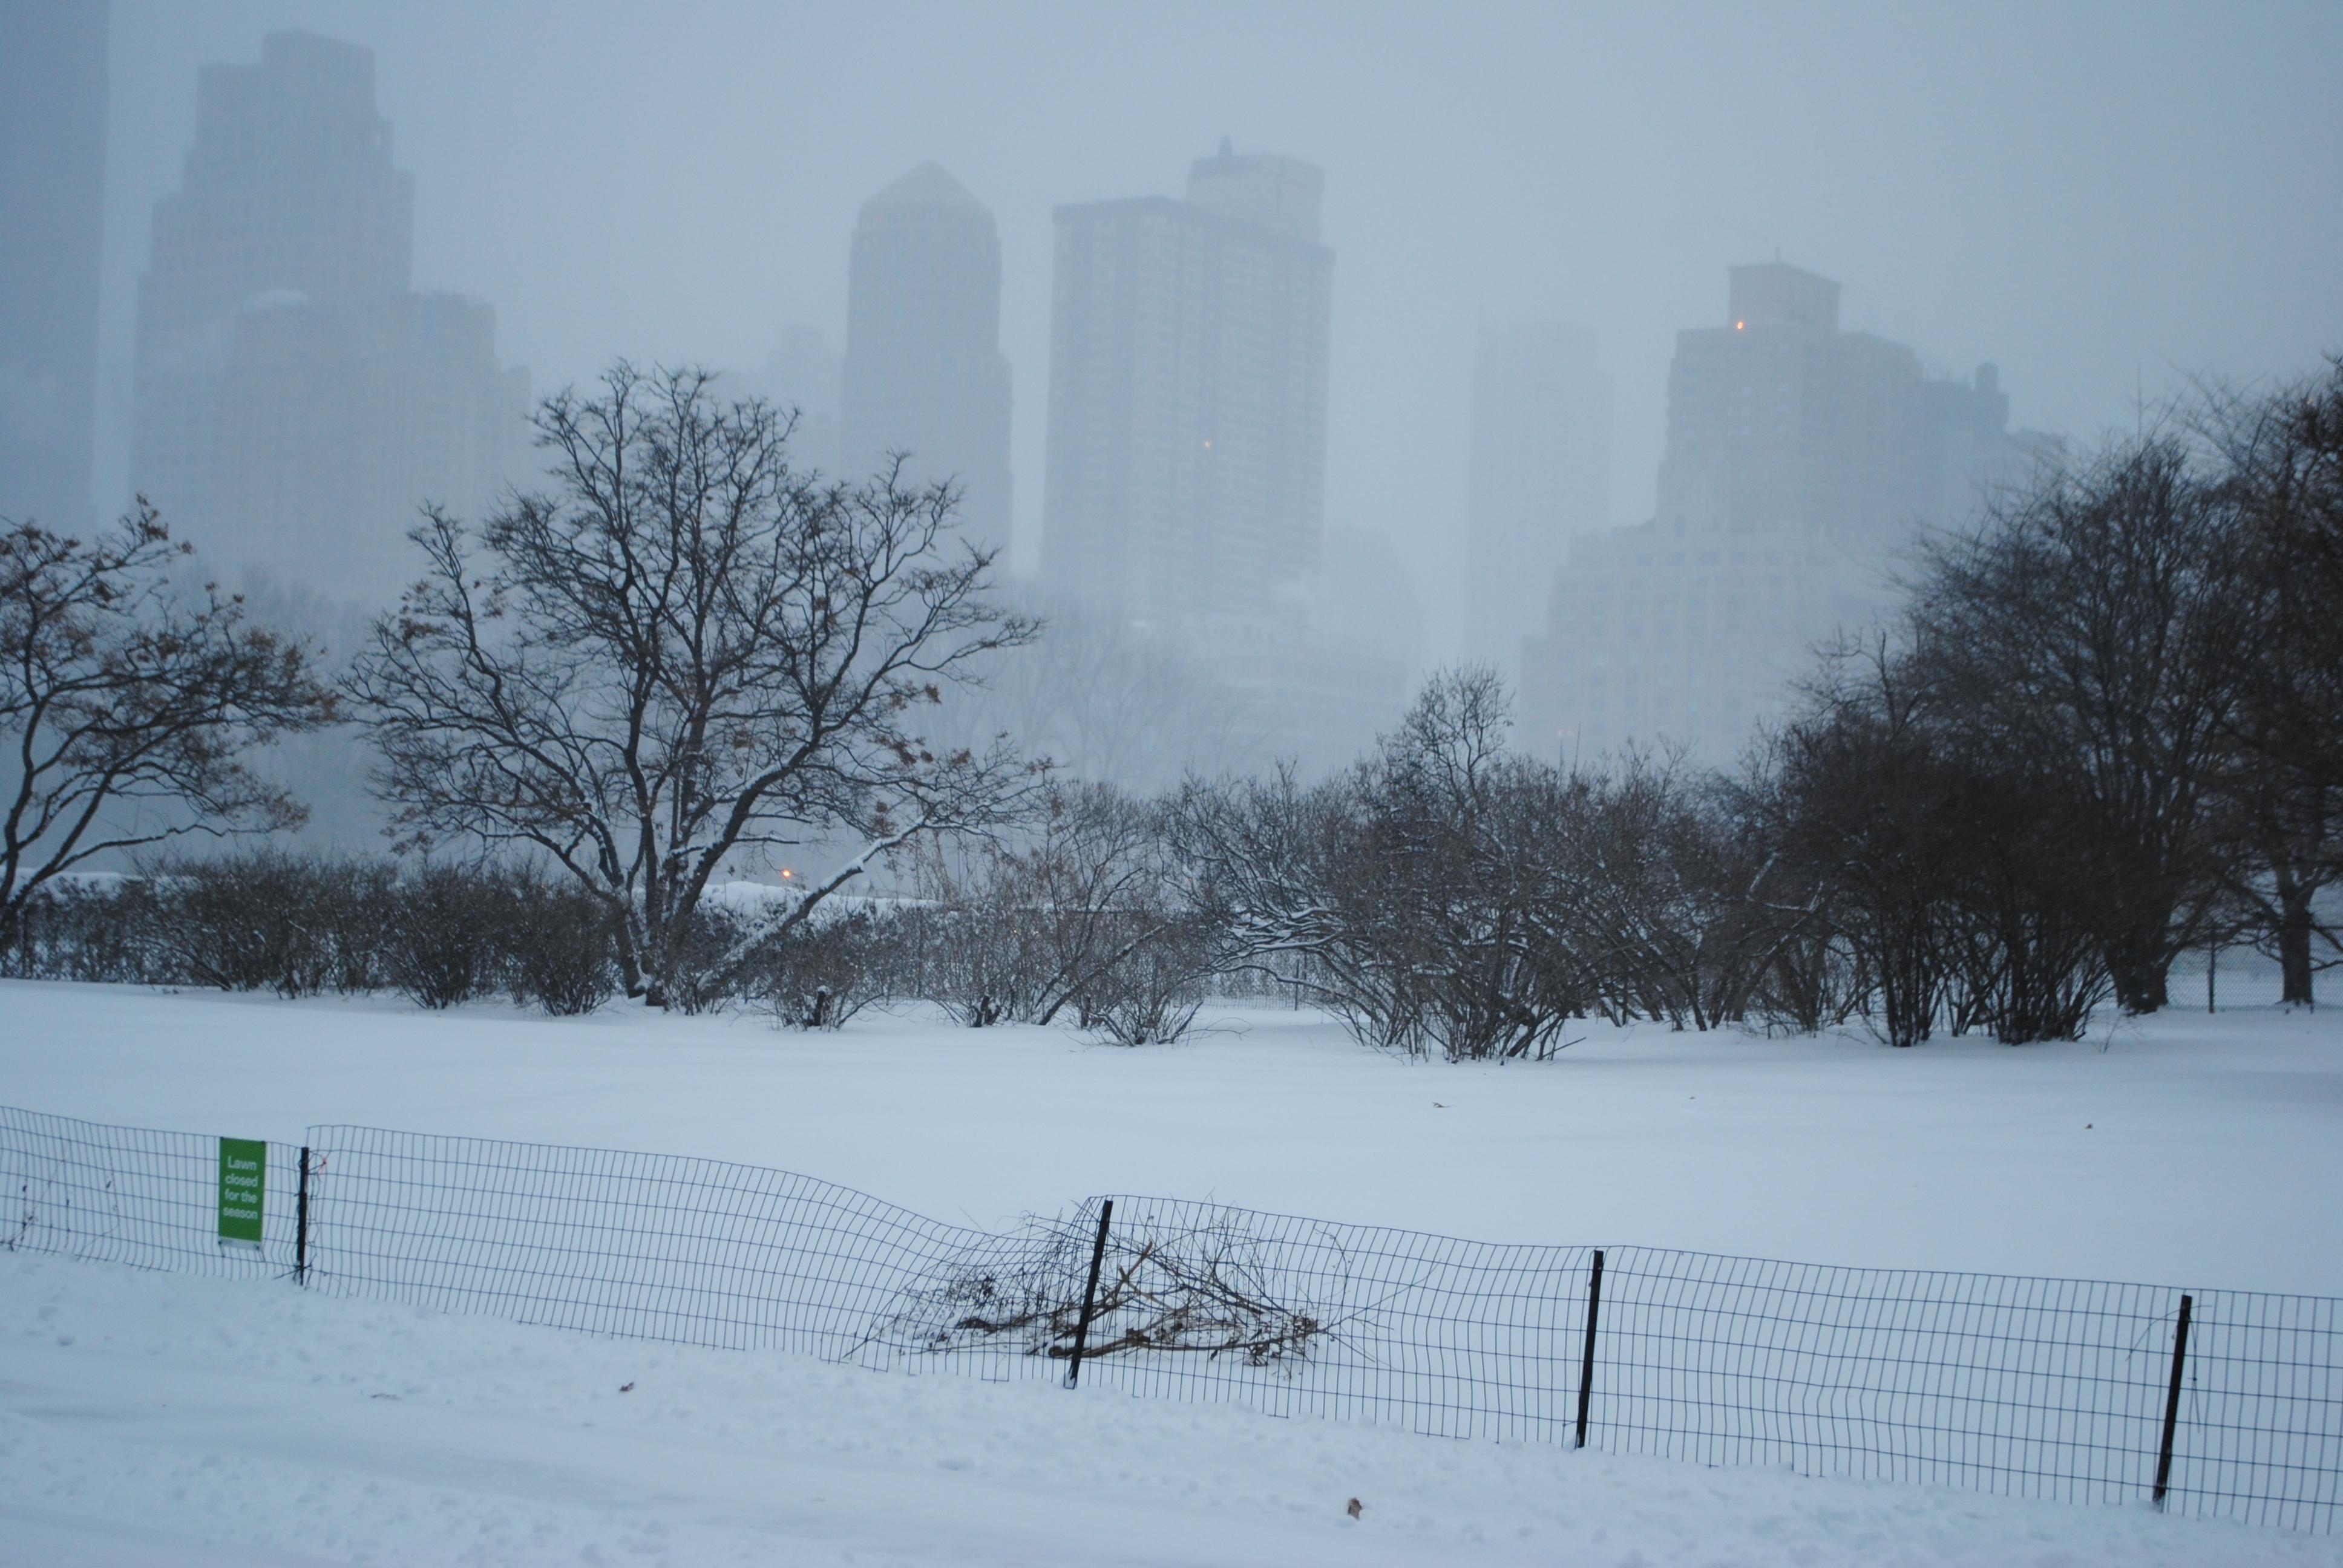 Central Park West skyline